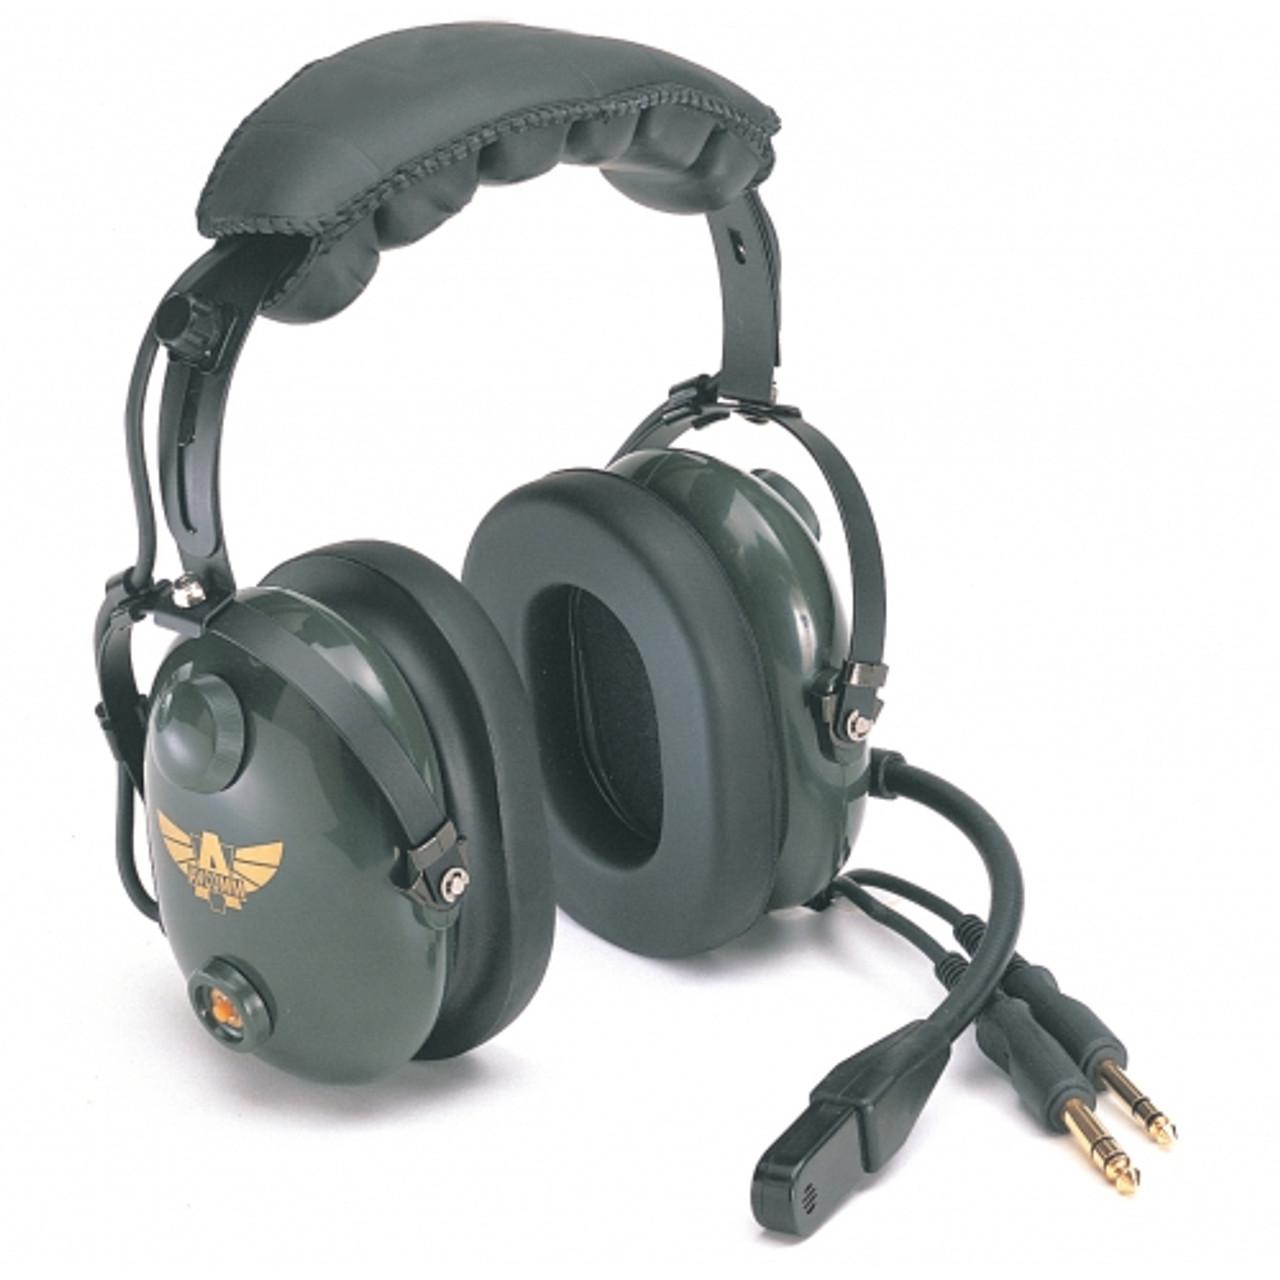 AVCOMM AC-900 PNR™ HEADSET WITH BLUETOOTH® AC900B